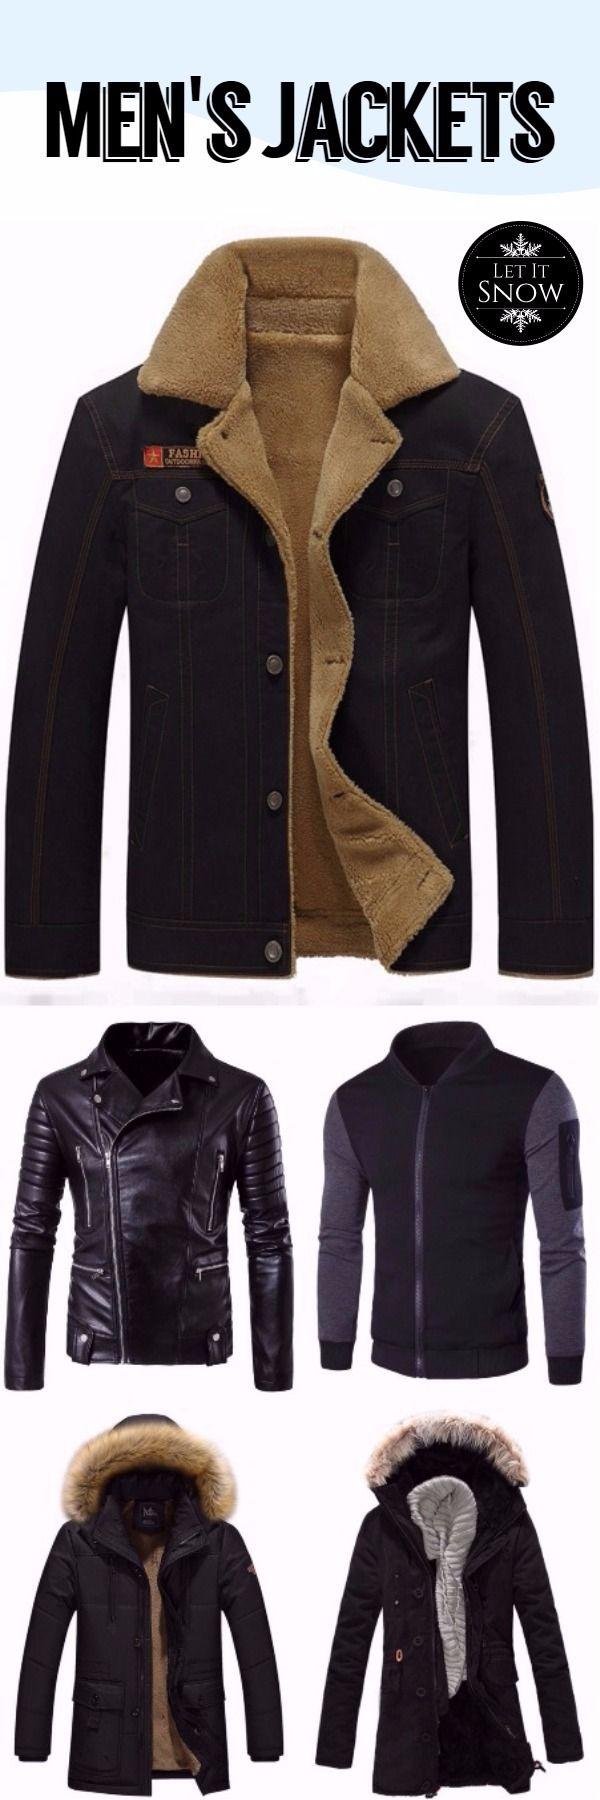 #Men's #Jackets #2017~2018 Up To 90% OFF   Men's Fashion   Fall & Winter Fashion   Sammydress.com